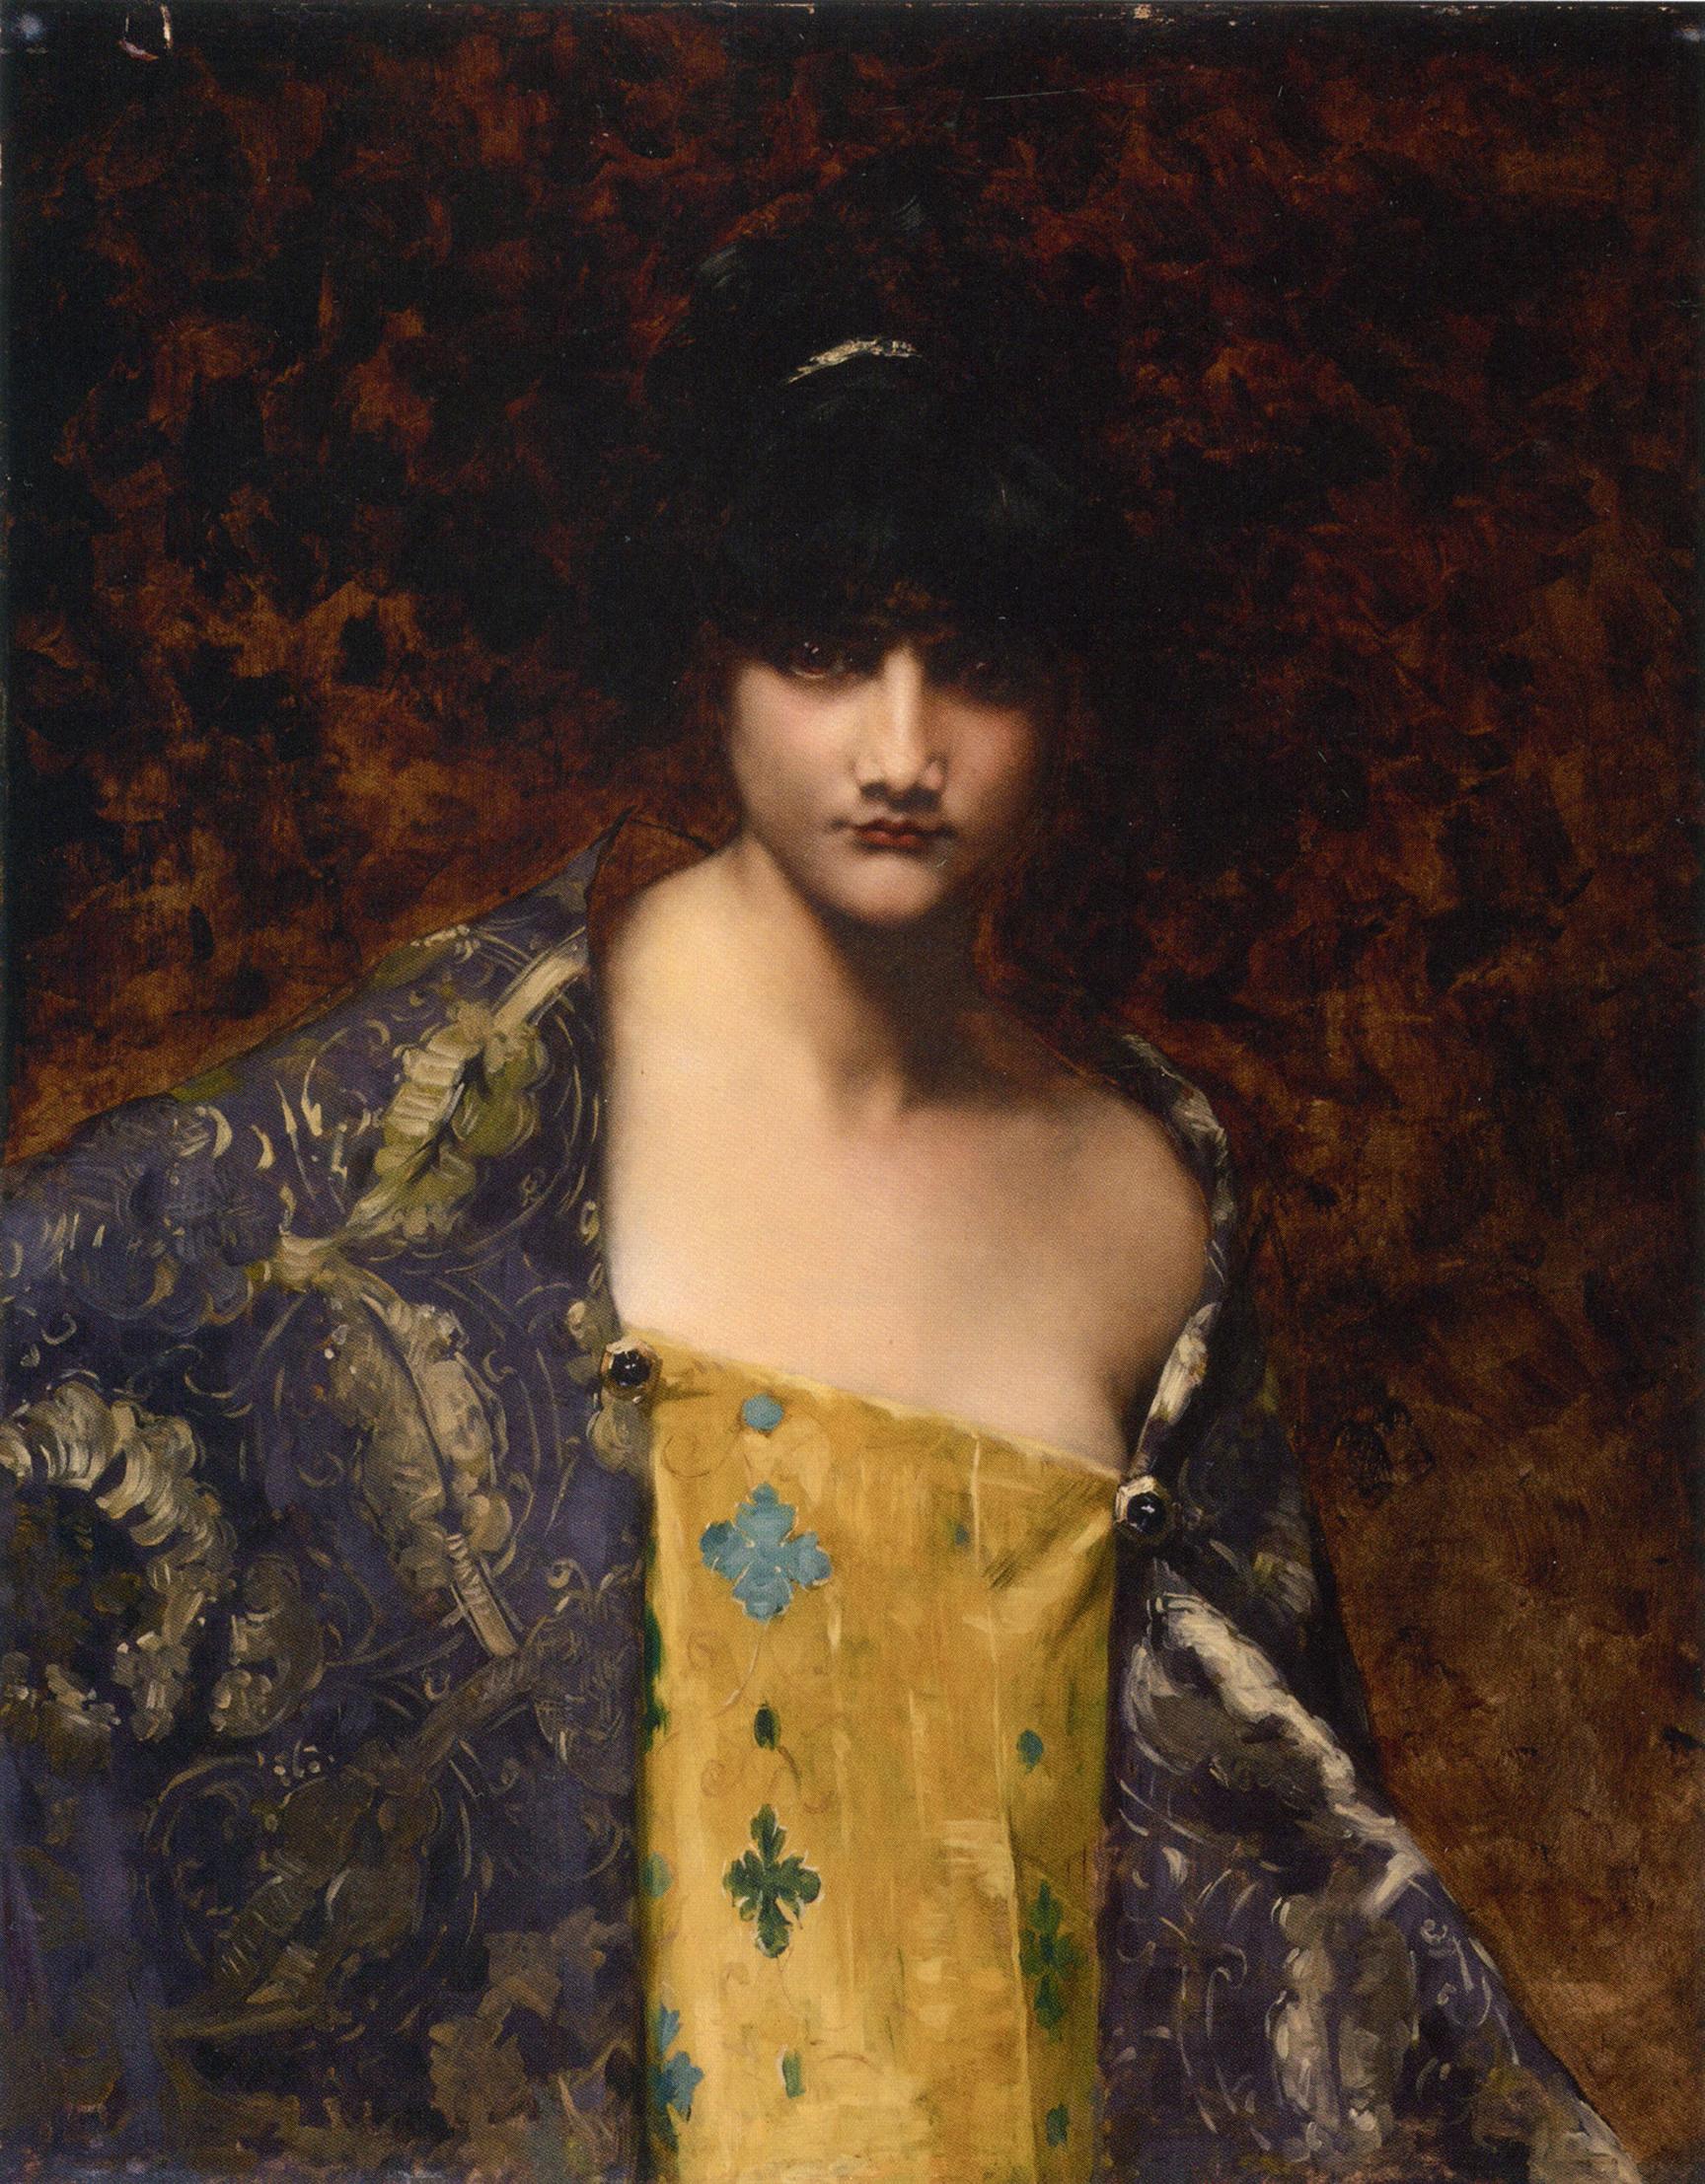 Dark Haired Beauty :: Juana Romani - Young beauties portraits in art and painting ôîòî